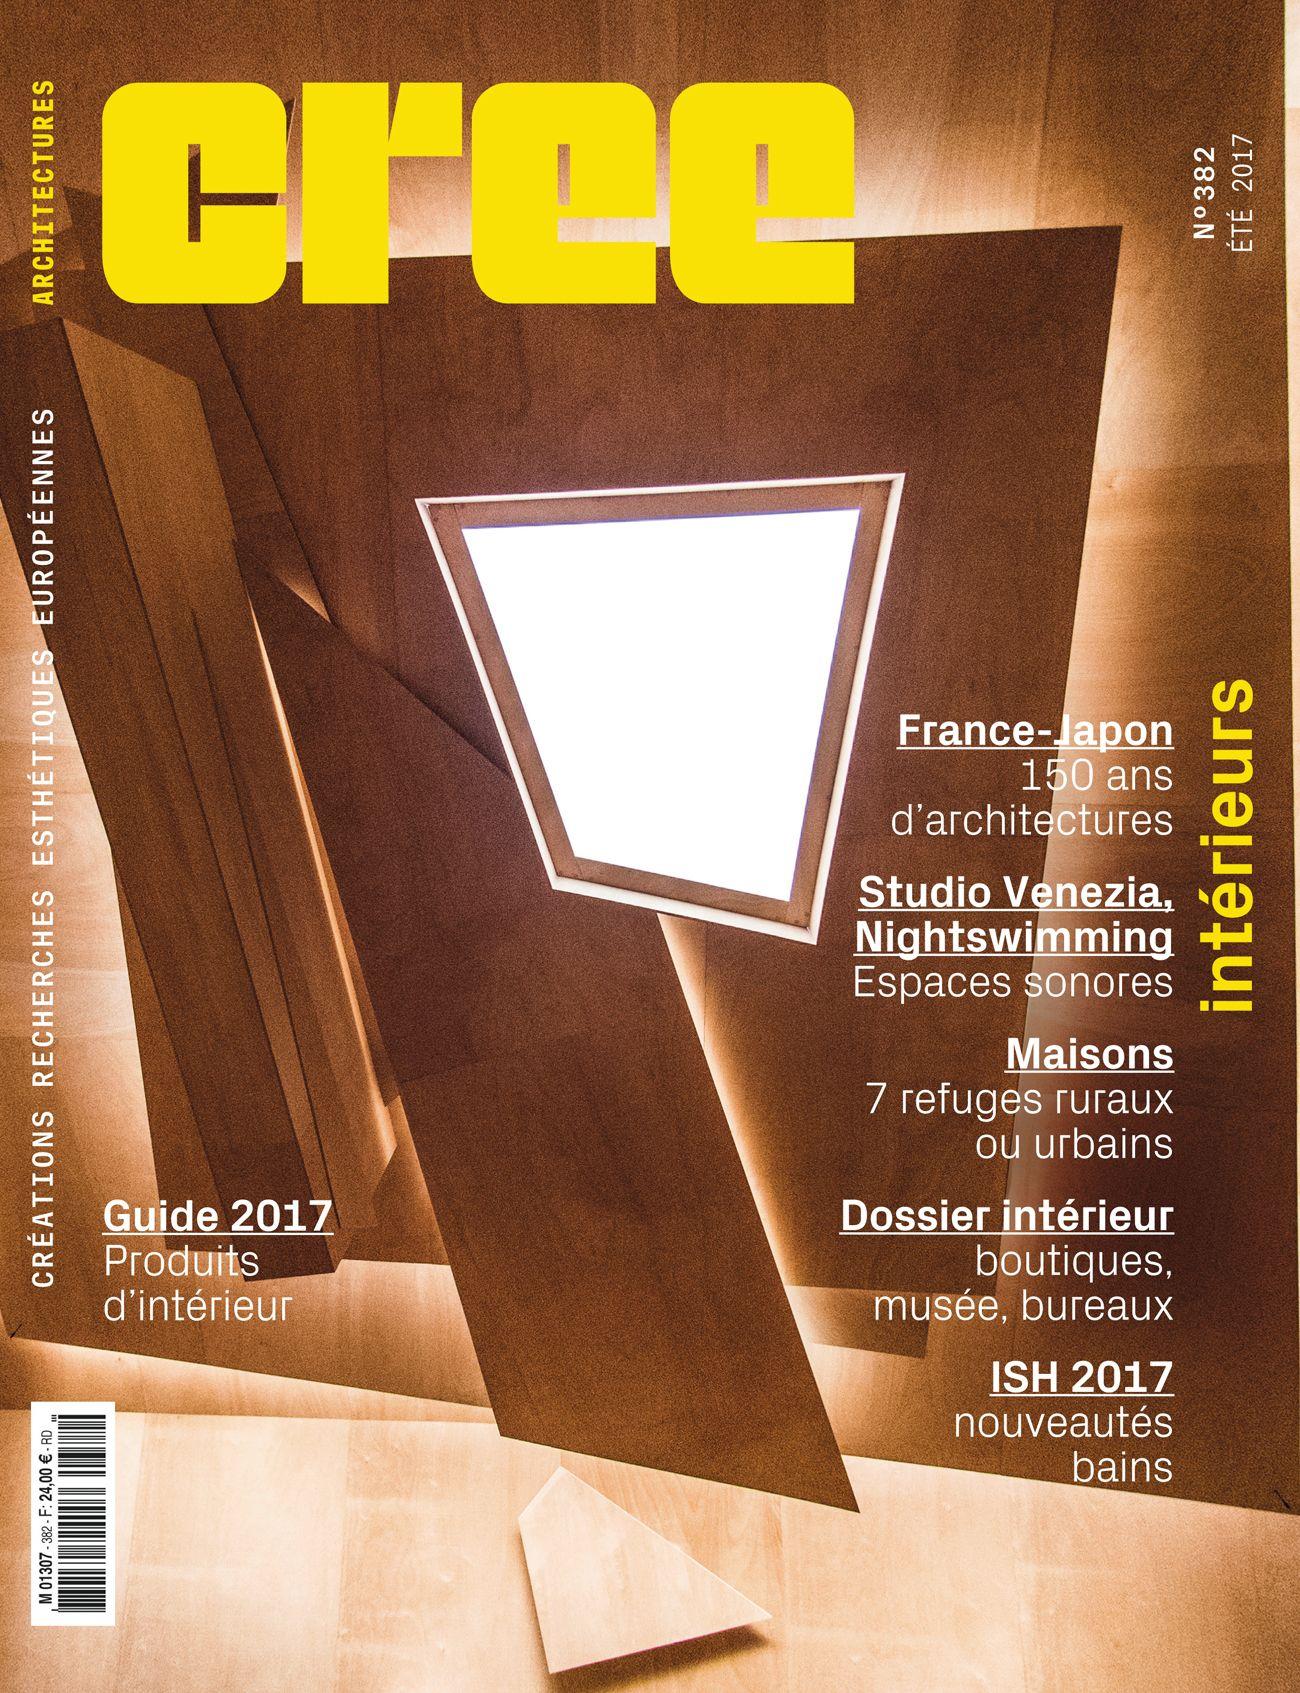 Architectures CREE 382